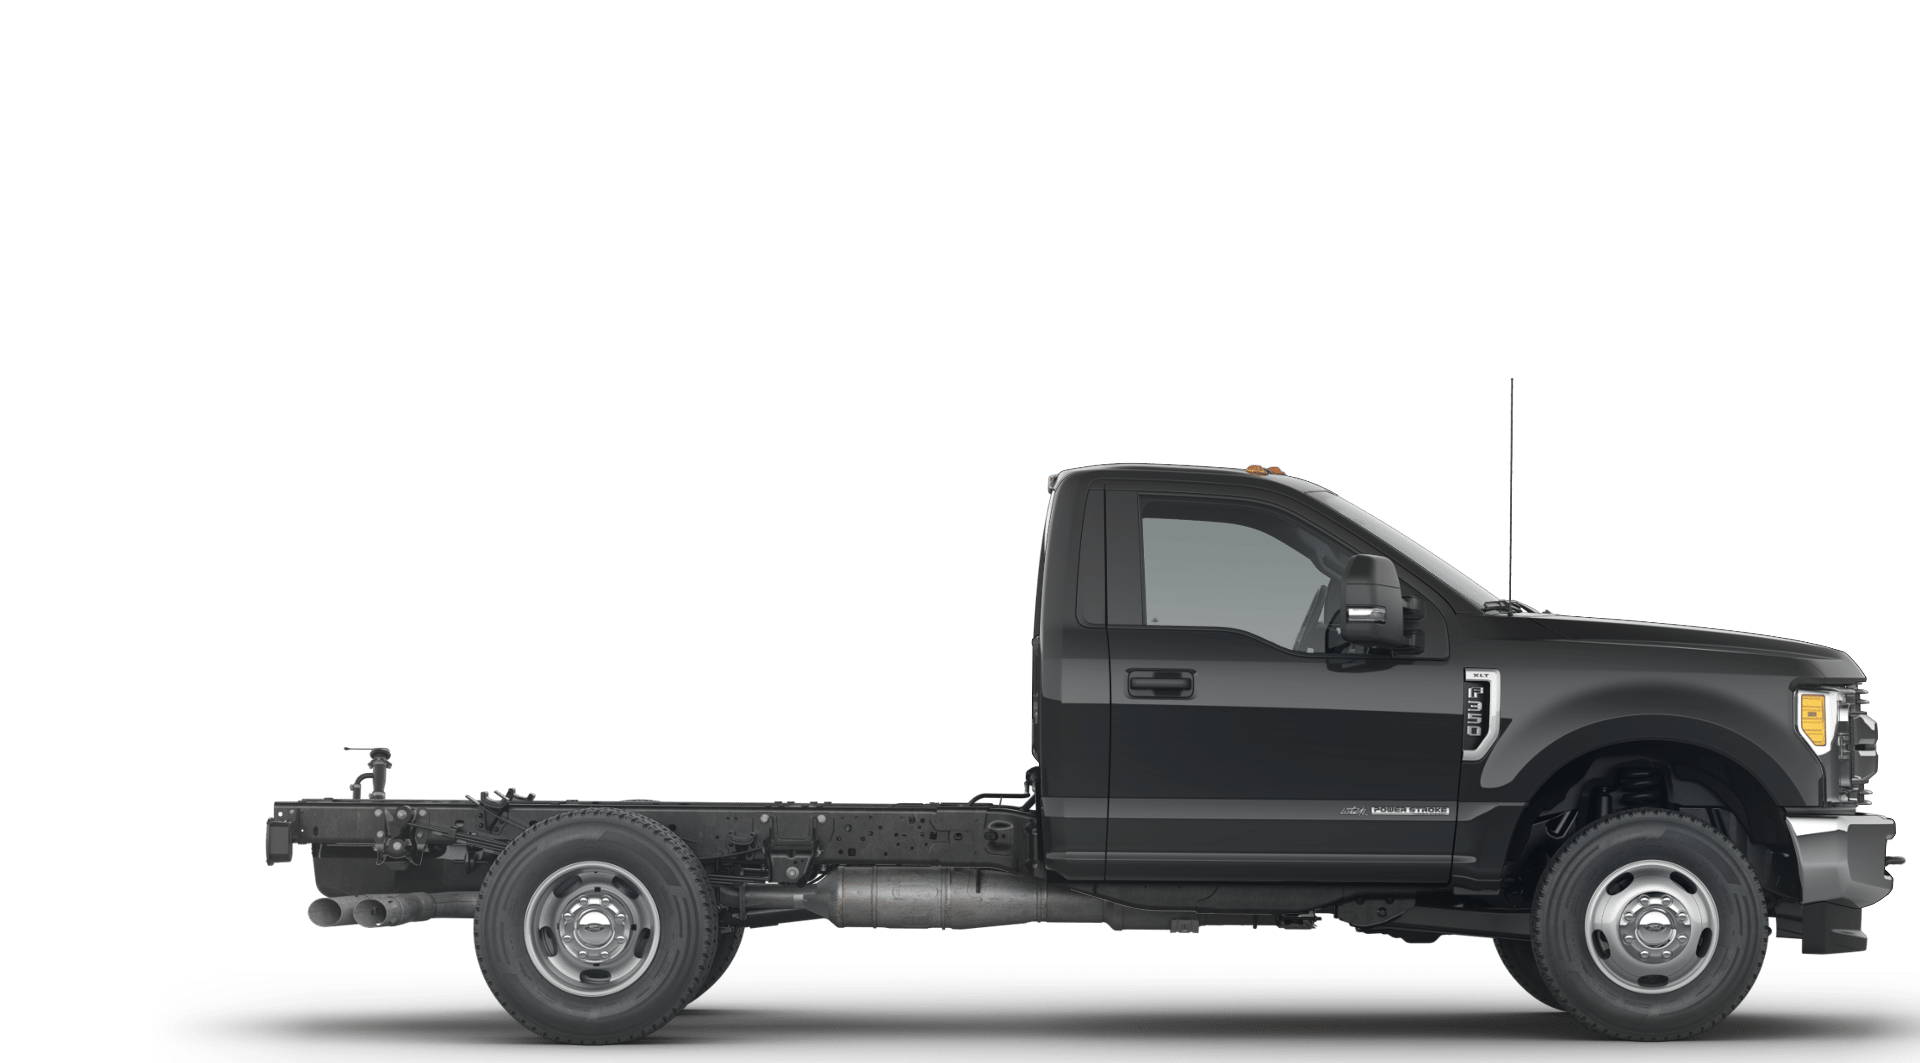 2019 F-350 Regular Cab DRW 4x4,  Cab Chassis #N8346 - photo 5